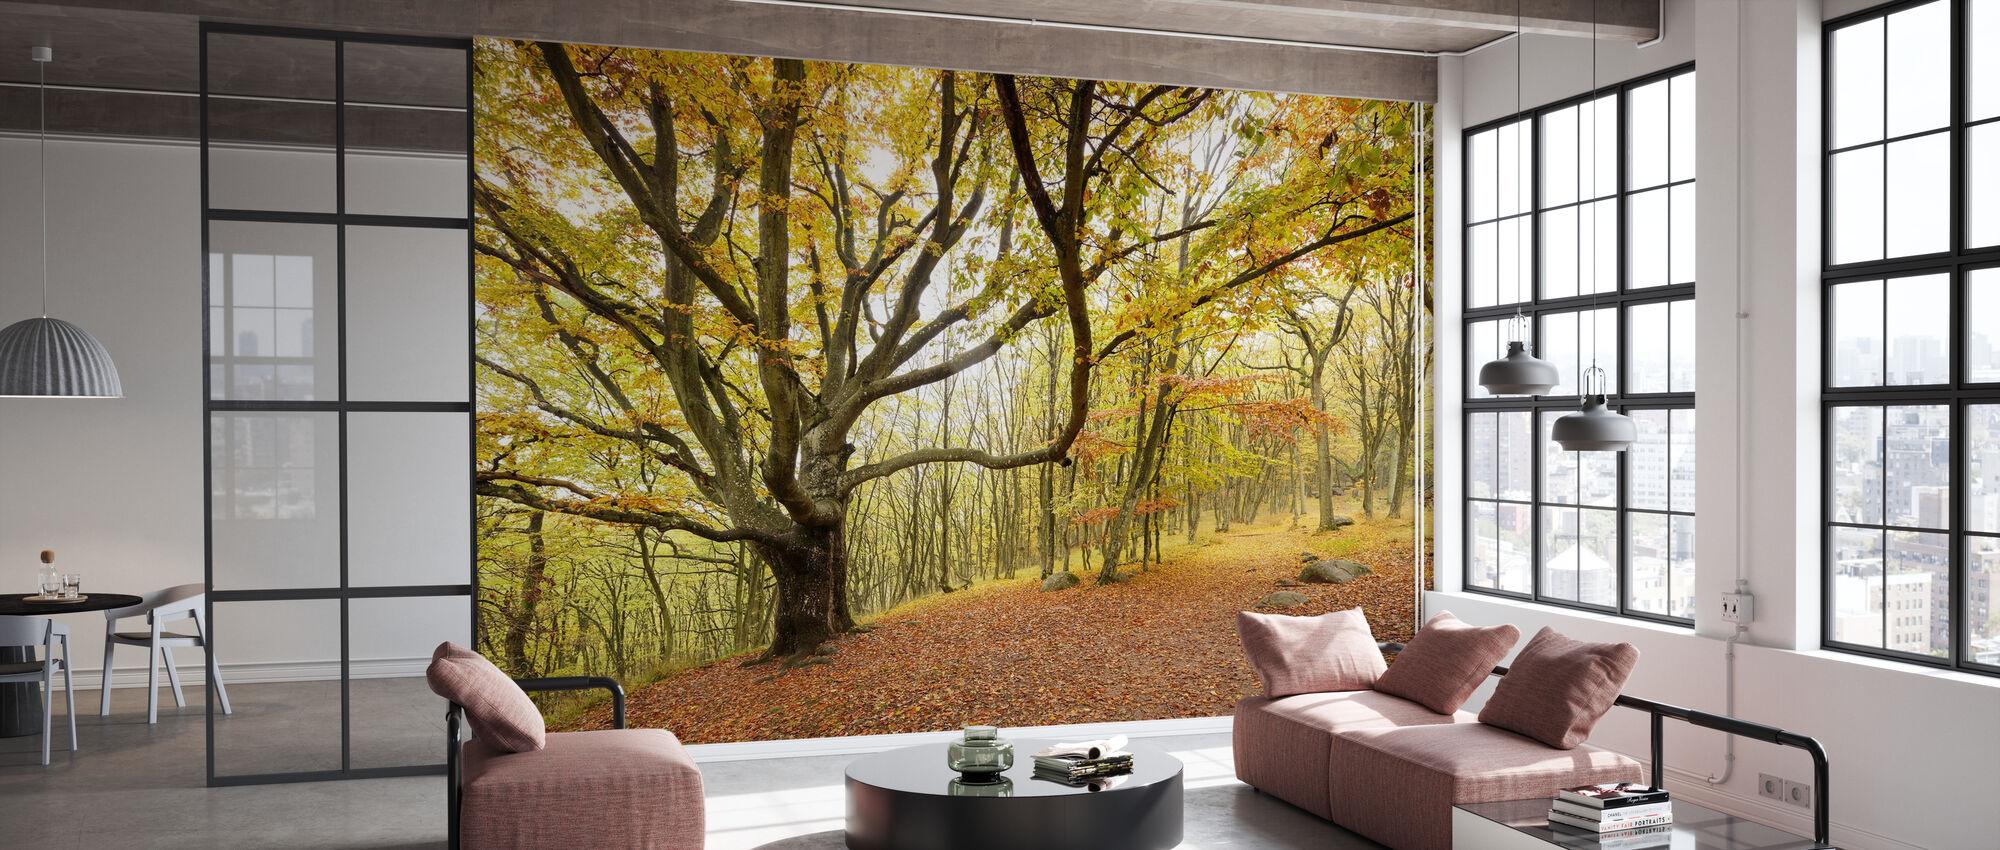 Autumn Trees in Stenshuvud, Sweden, Europe - Wallpaper - Office